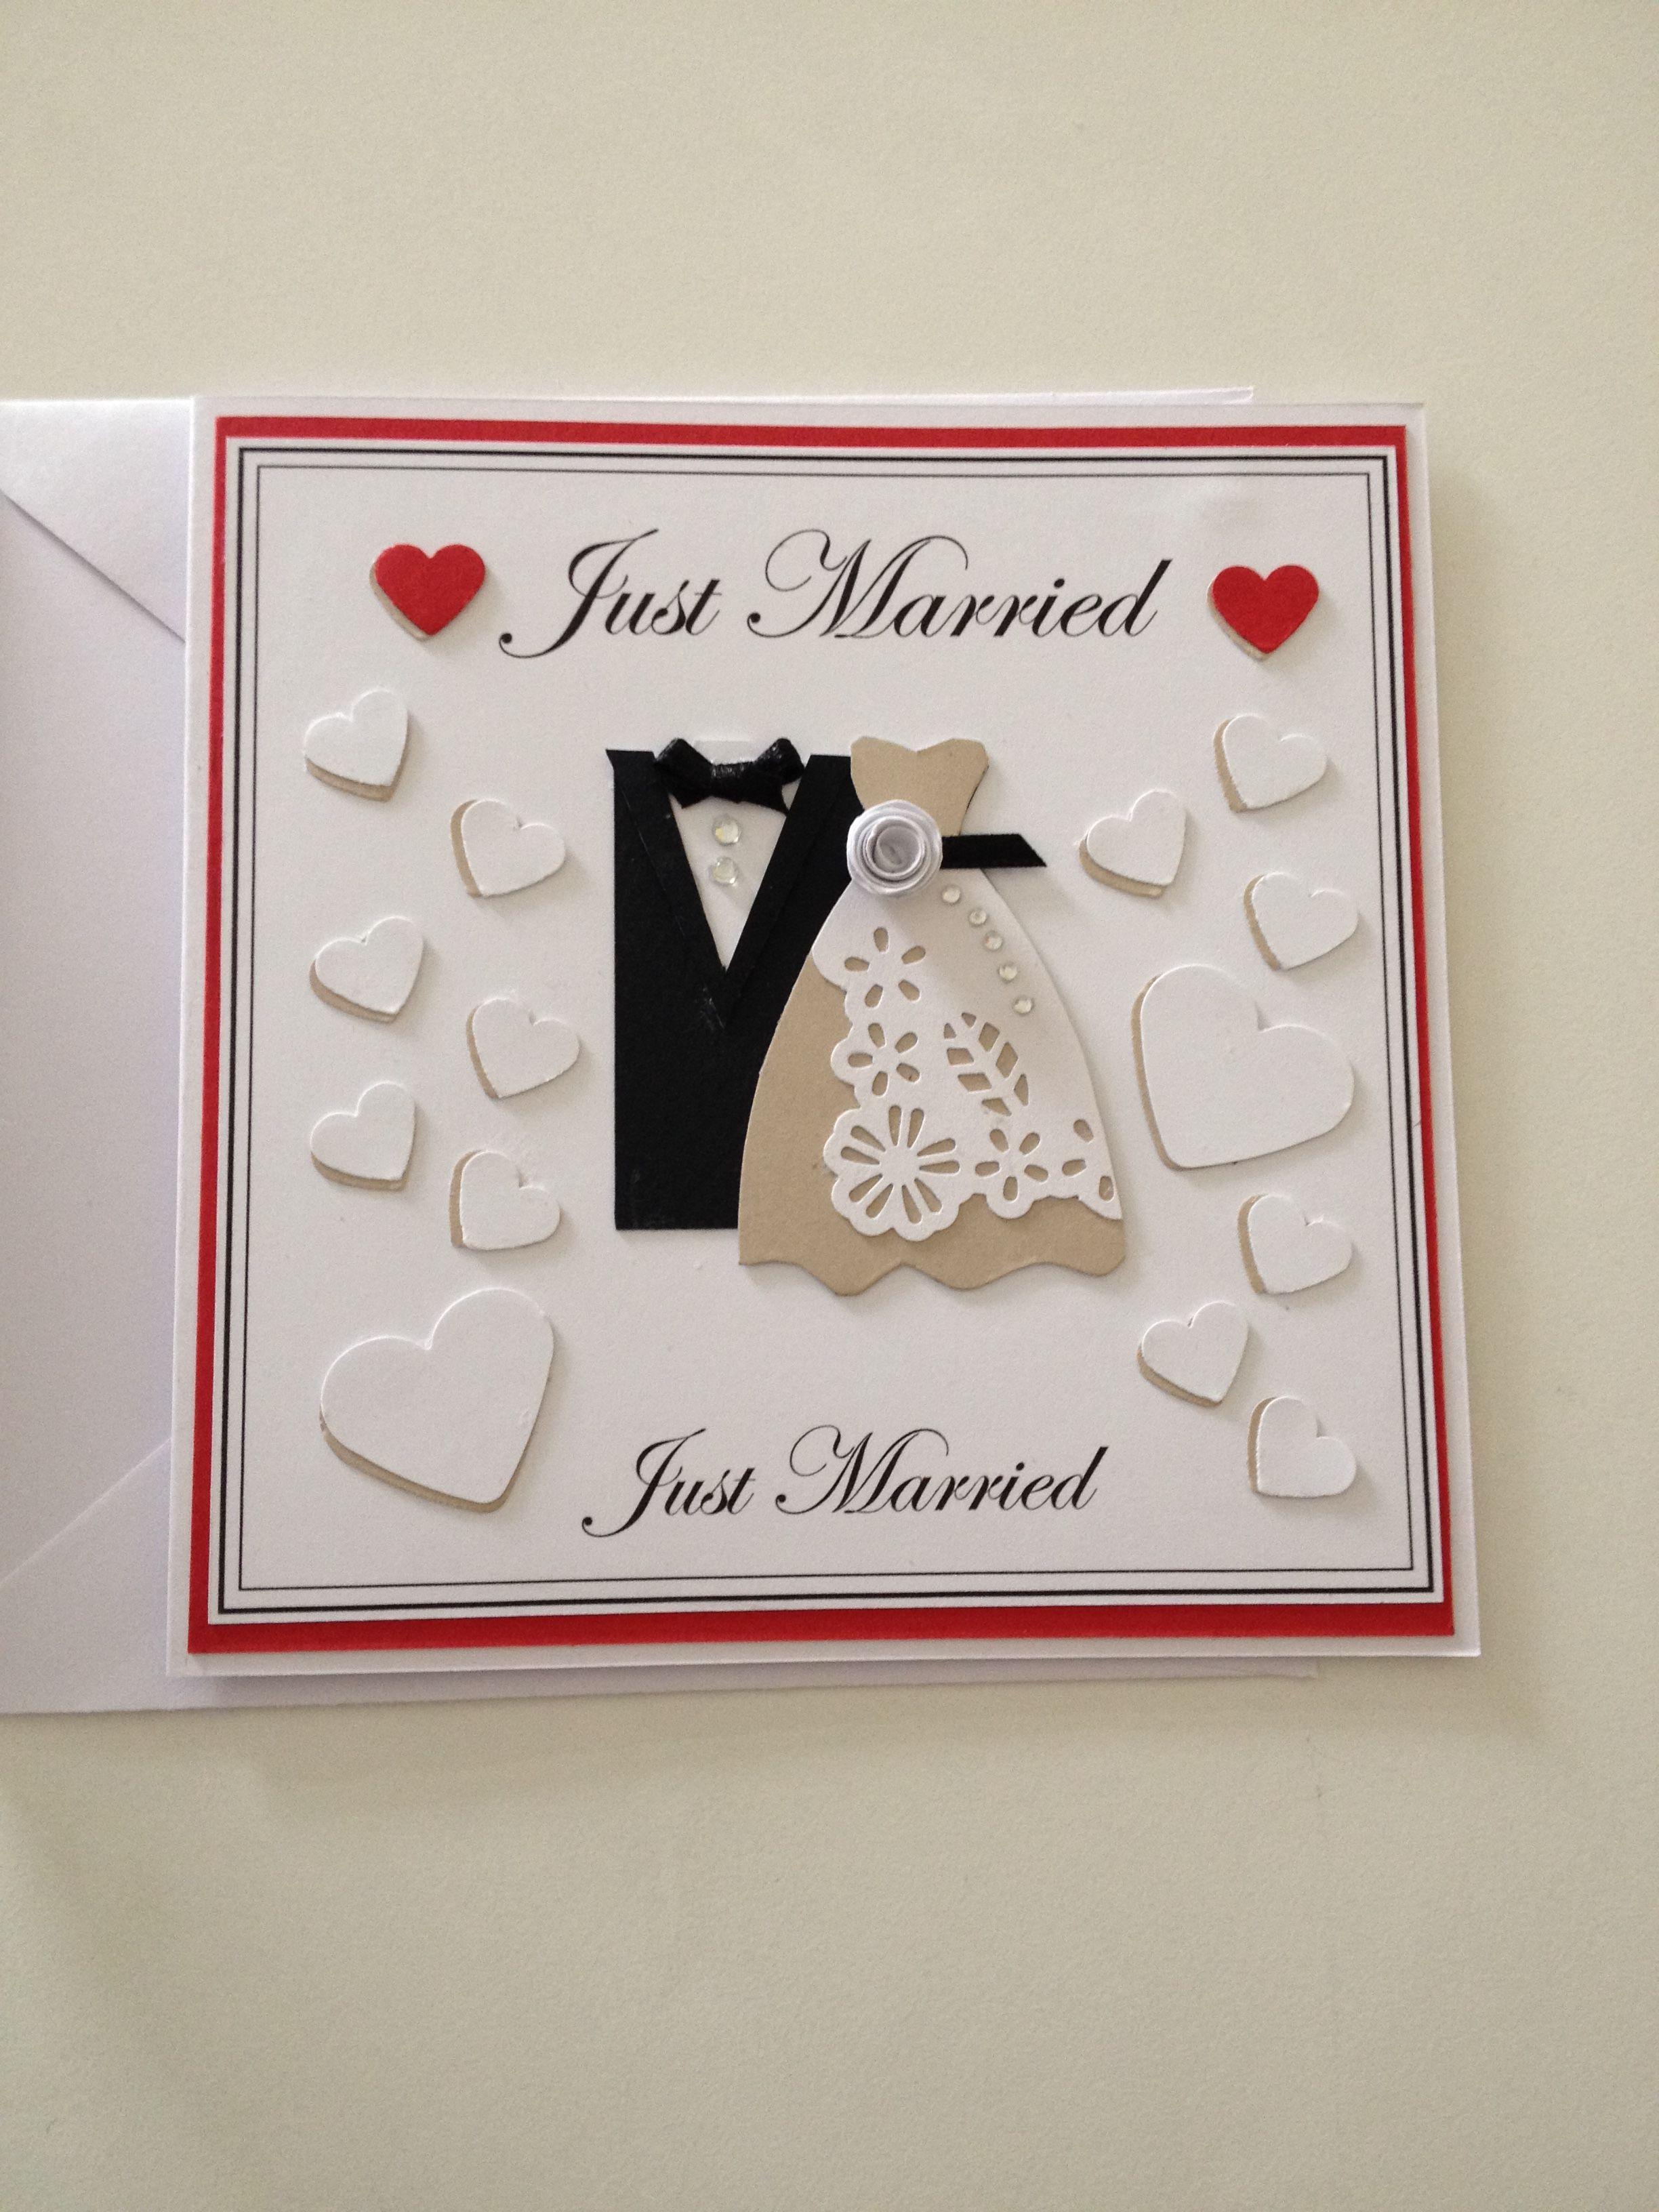 Auguri Matrimonio Yahoo : Biglietto auguri per matrimonio